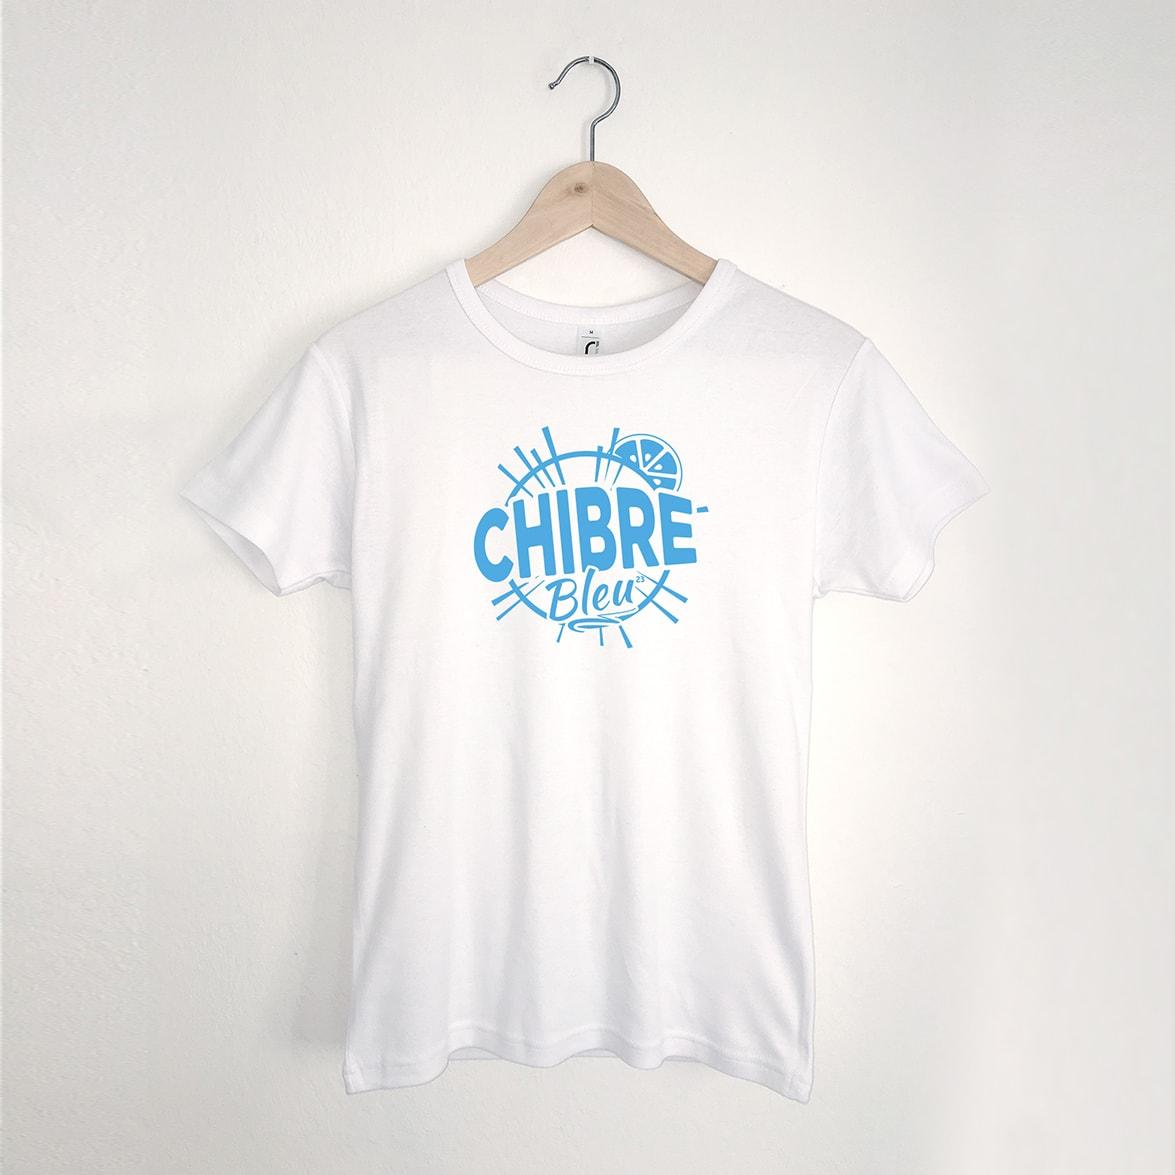 tshirt-chibre-bleu-serigraphie-original copie